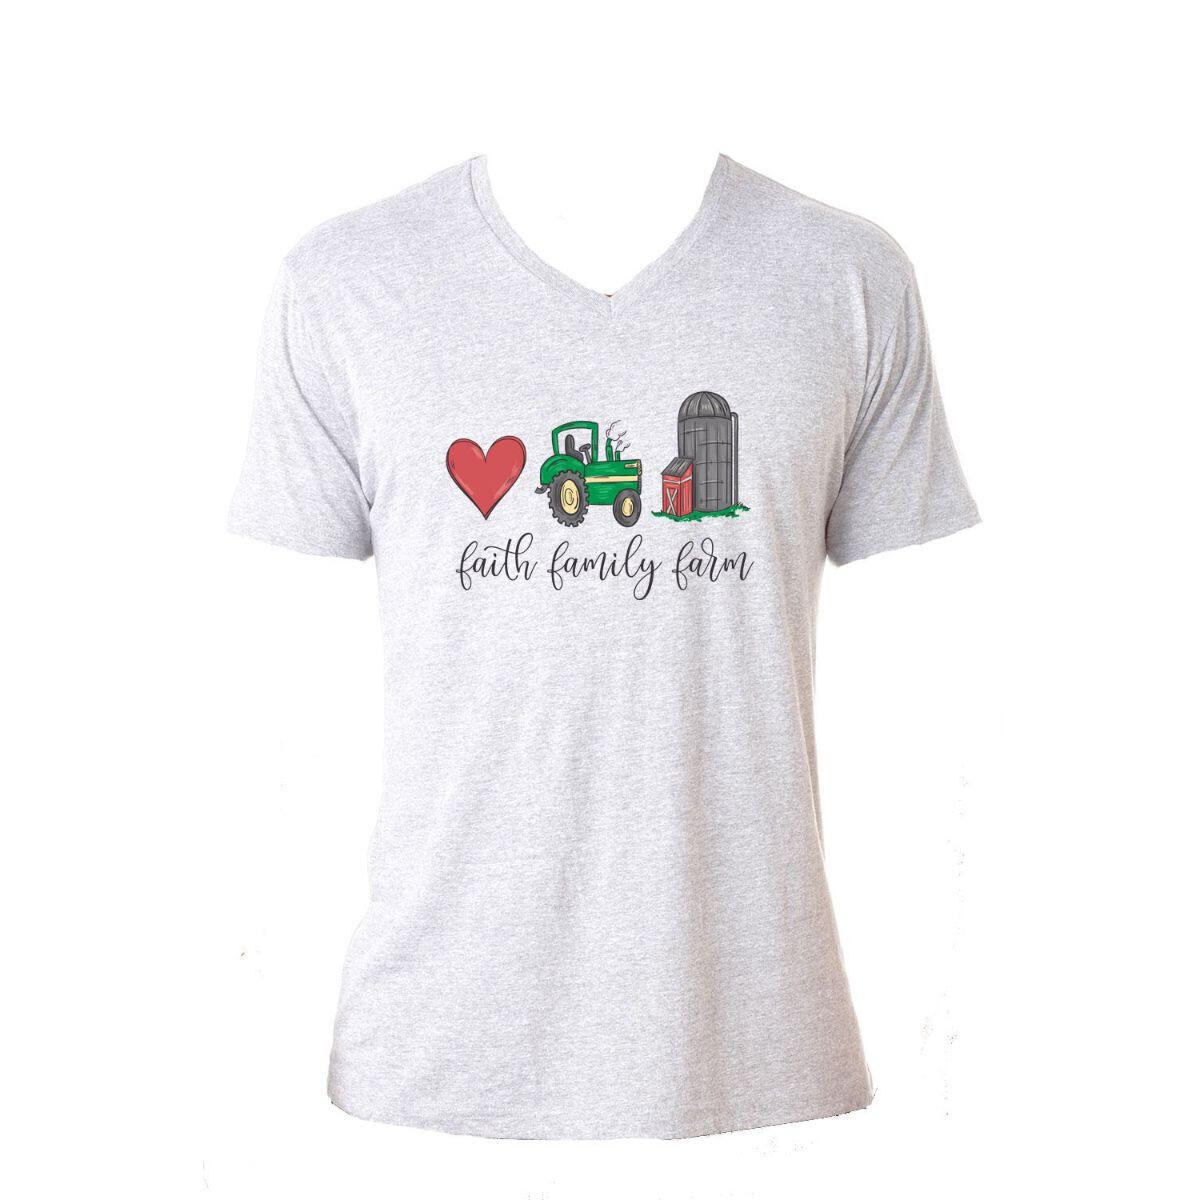 Jane Marie Faith Family Farm Tshirt